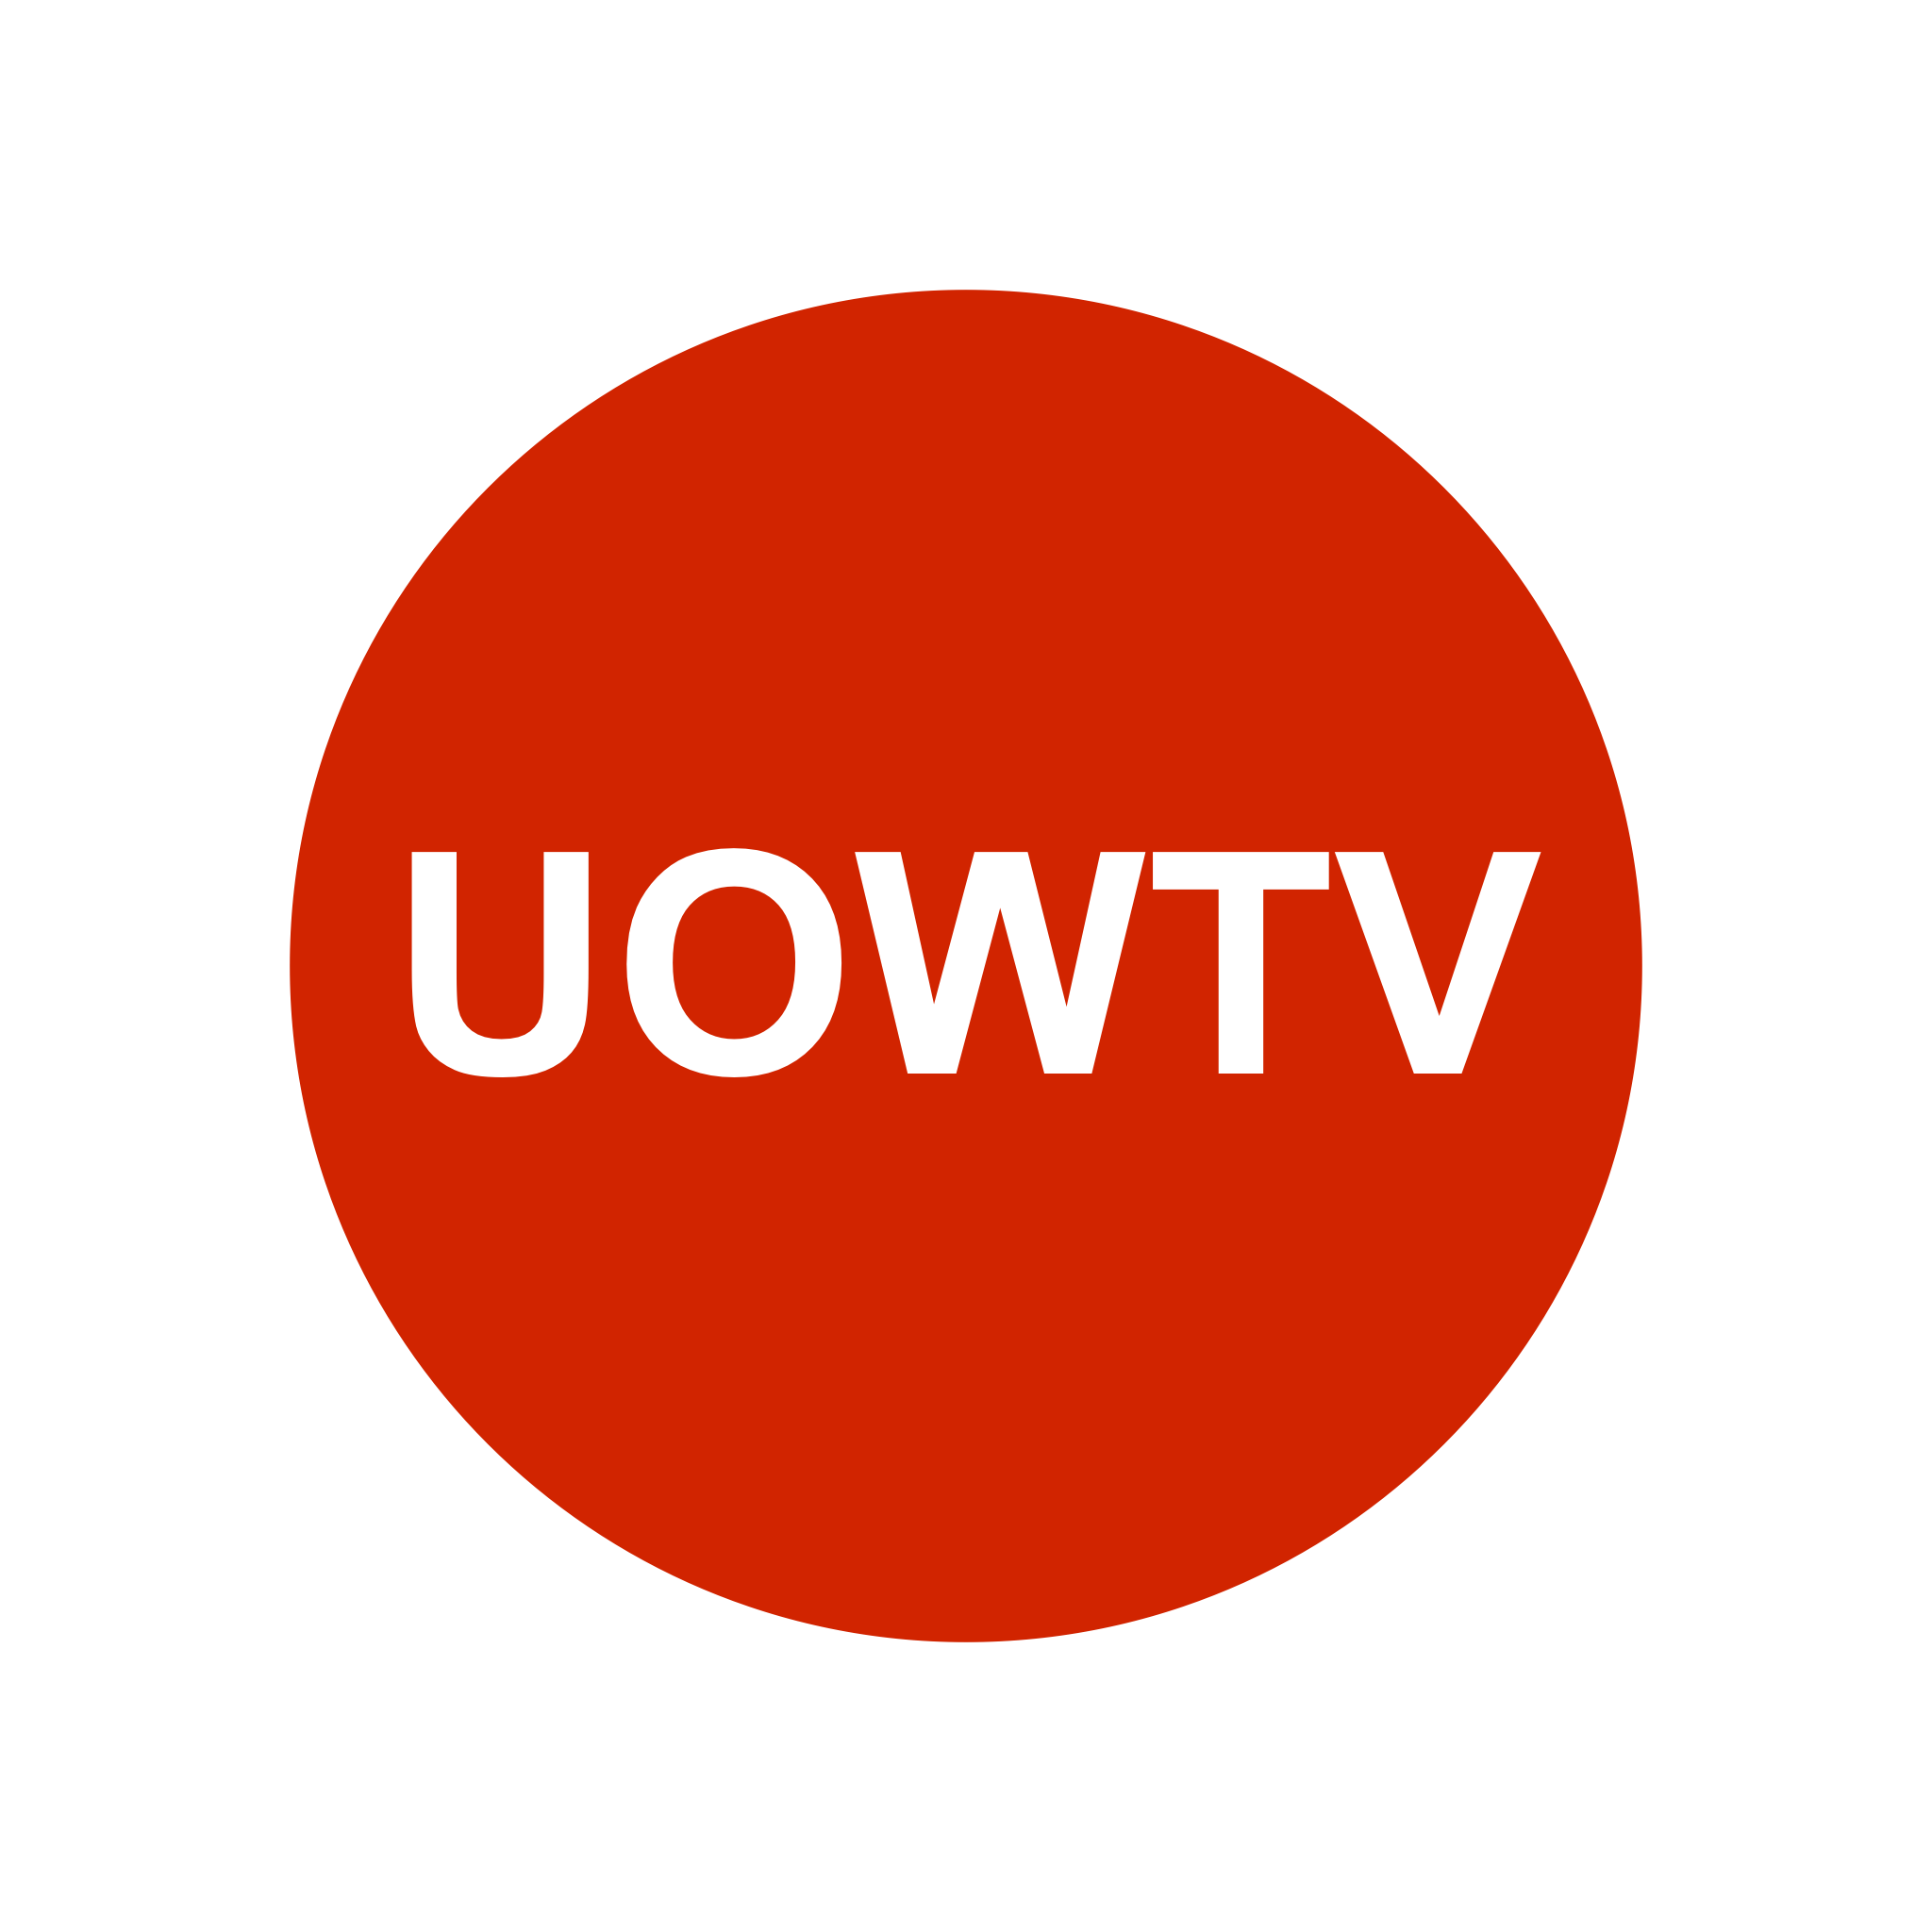 UOWTV